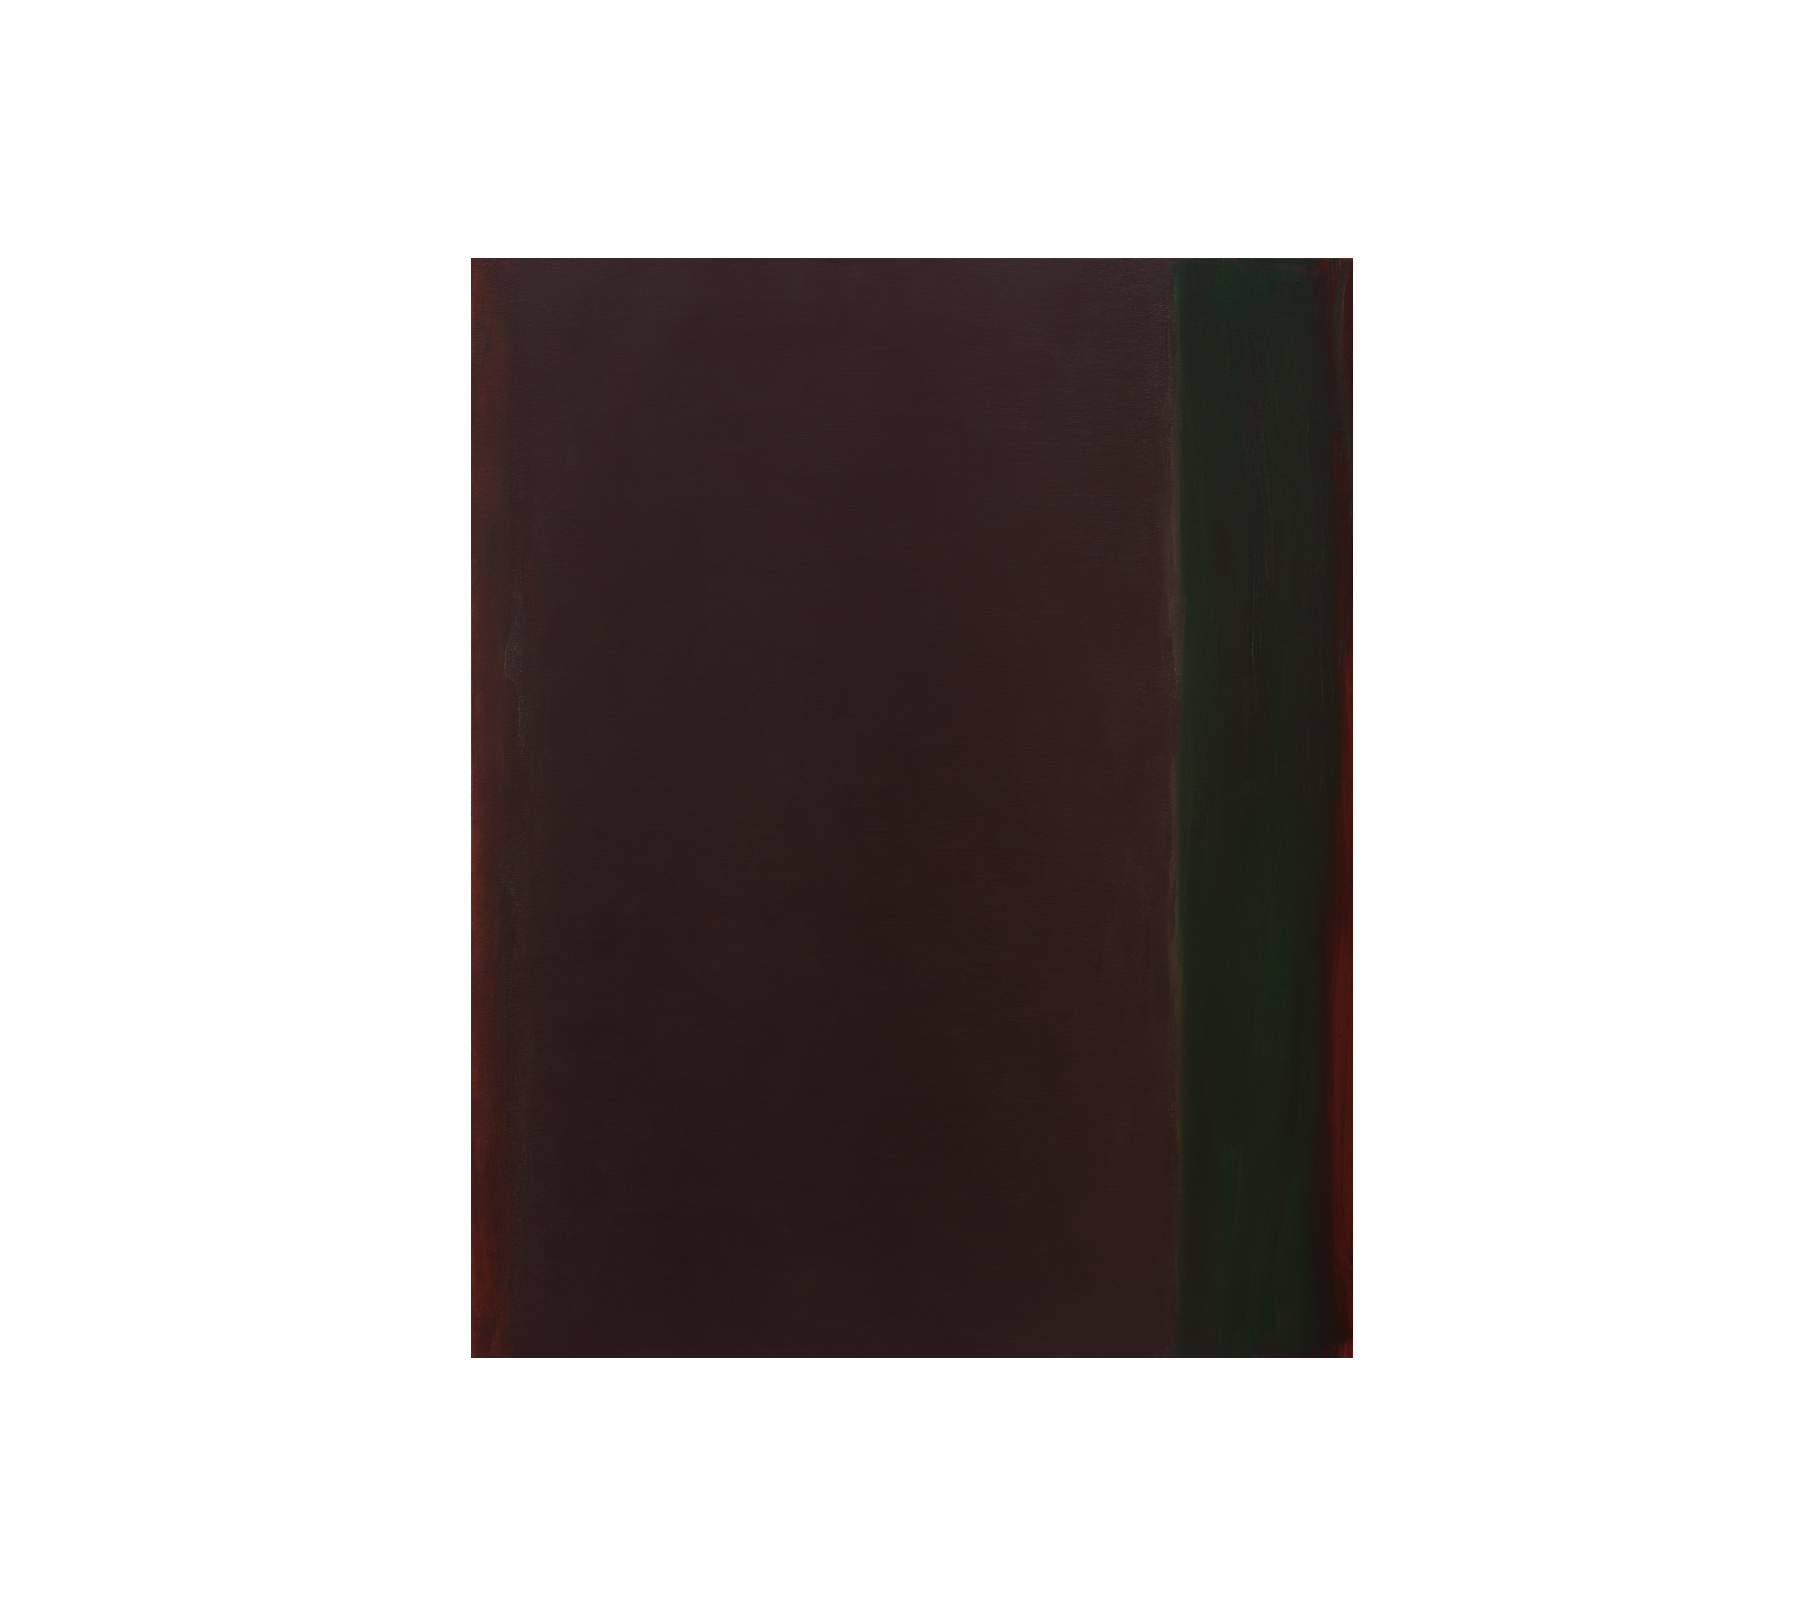 Untitled 2019 150x120cm